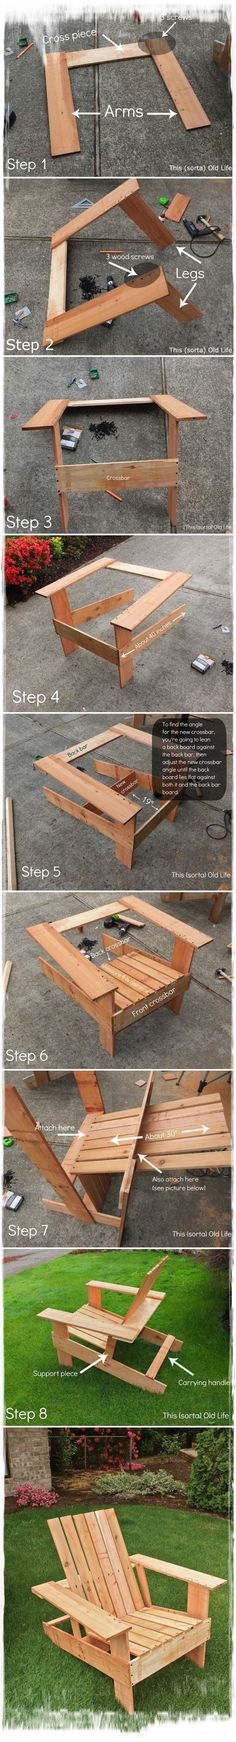 DIY Adirondack Chair Tutorial